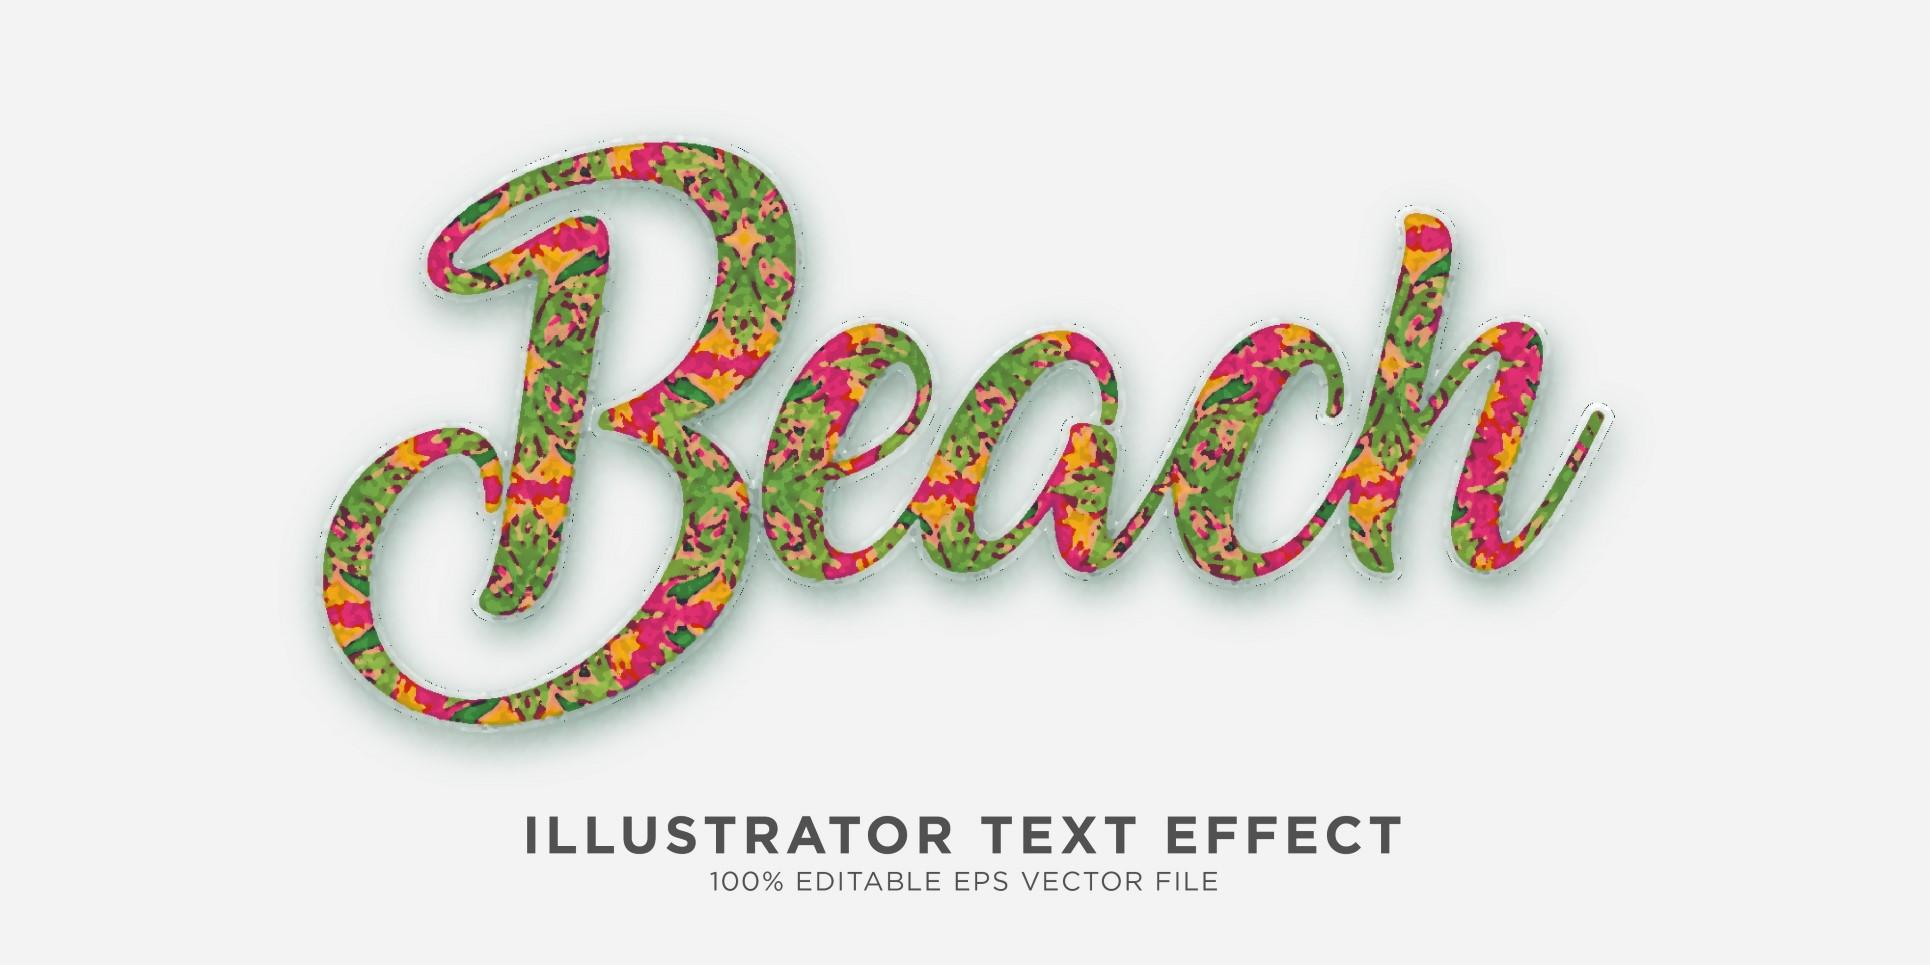 Beach illustrator Text Effect Illustration